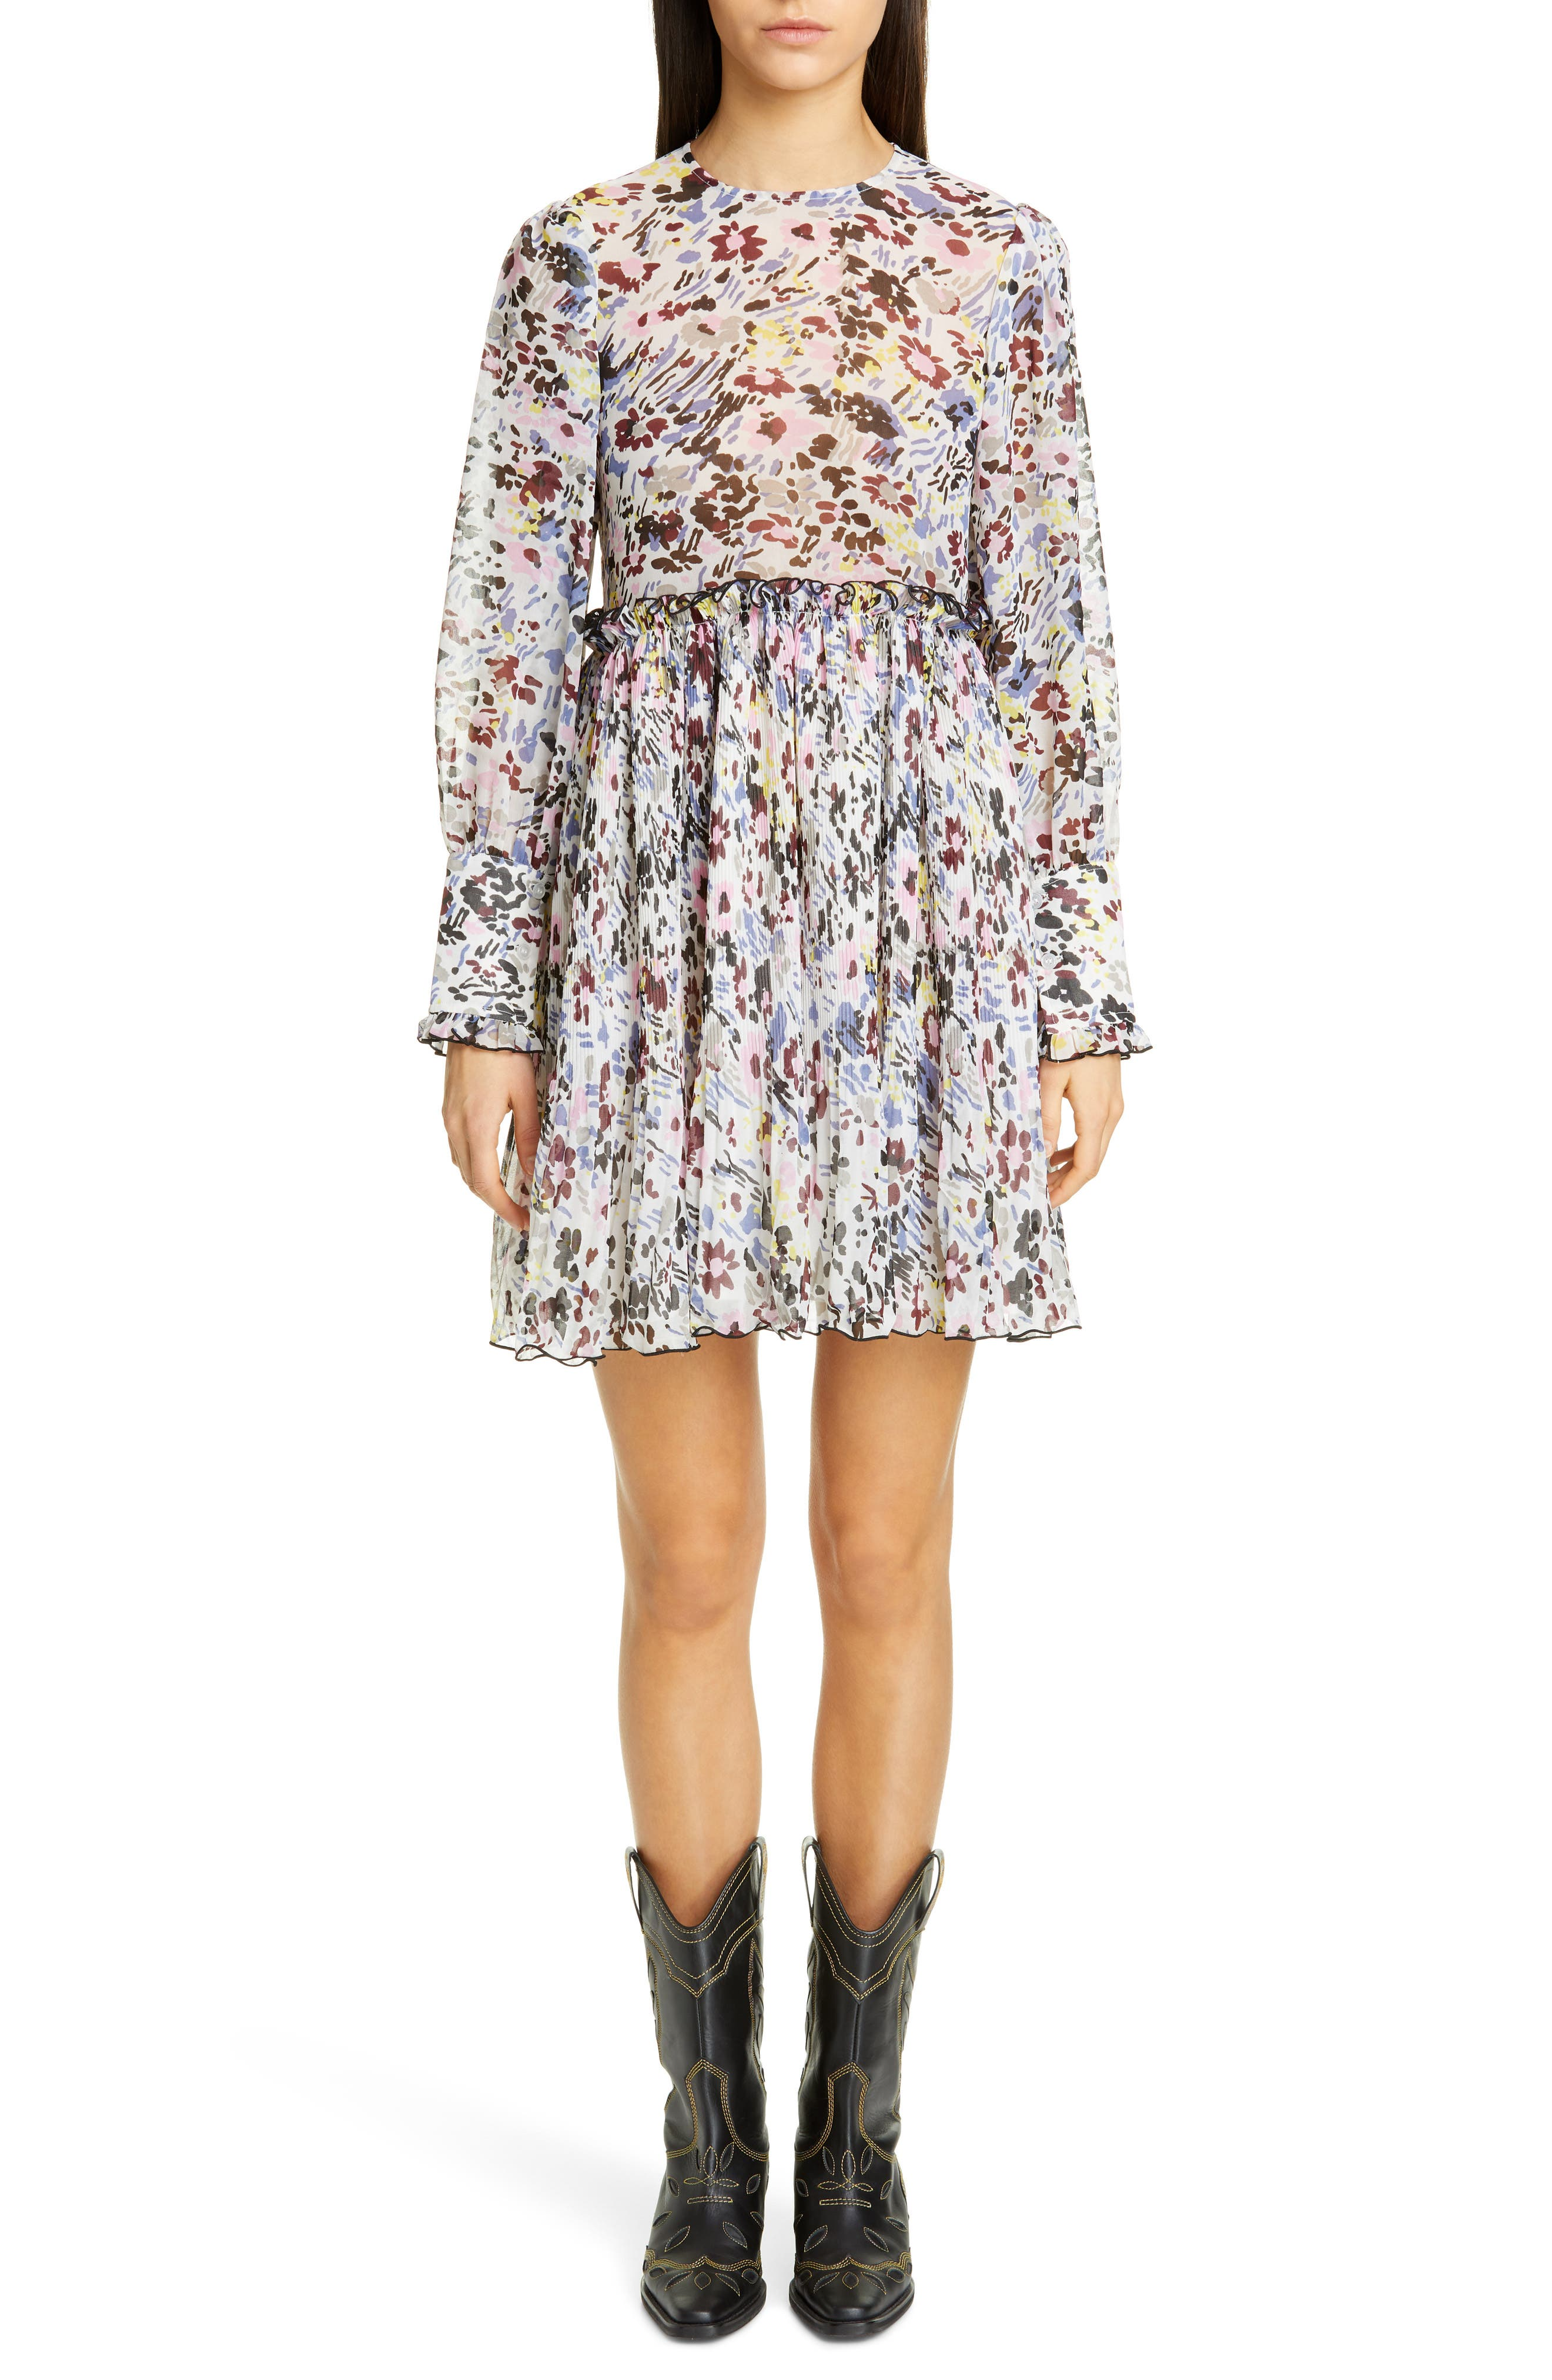 Ganni Long Sleeve Floral Print Georgette Dress, US / 4 - Ivory